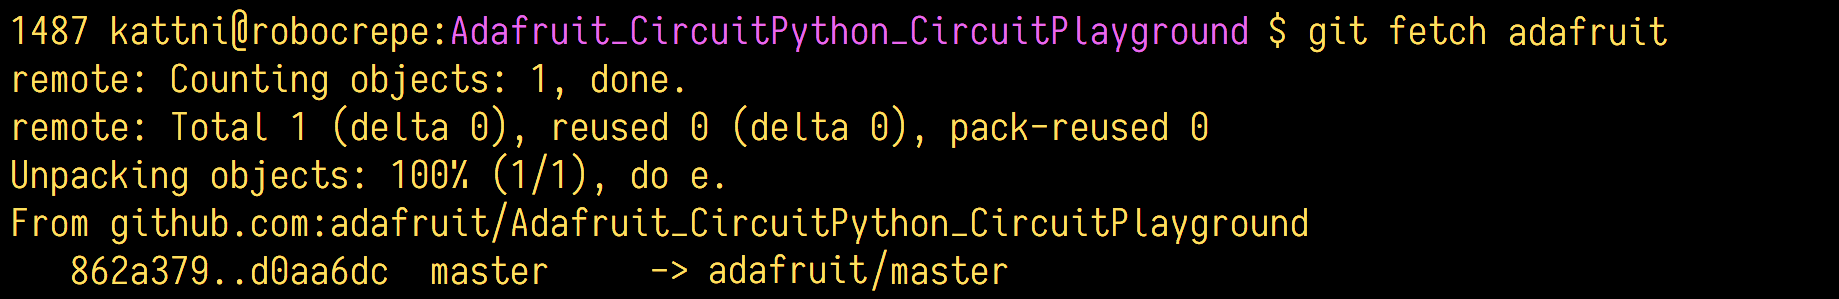 circuitpython_GitUpdateFetchAdafruit.png